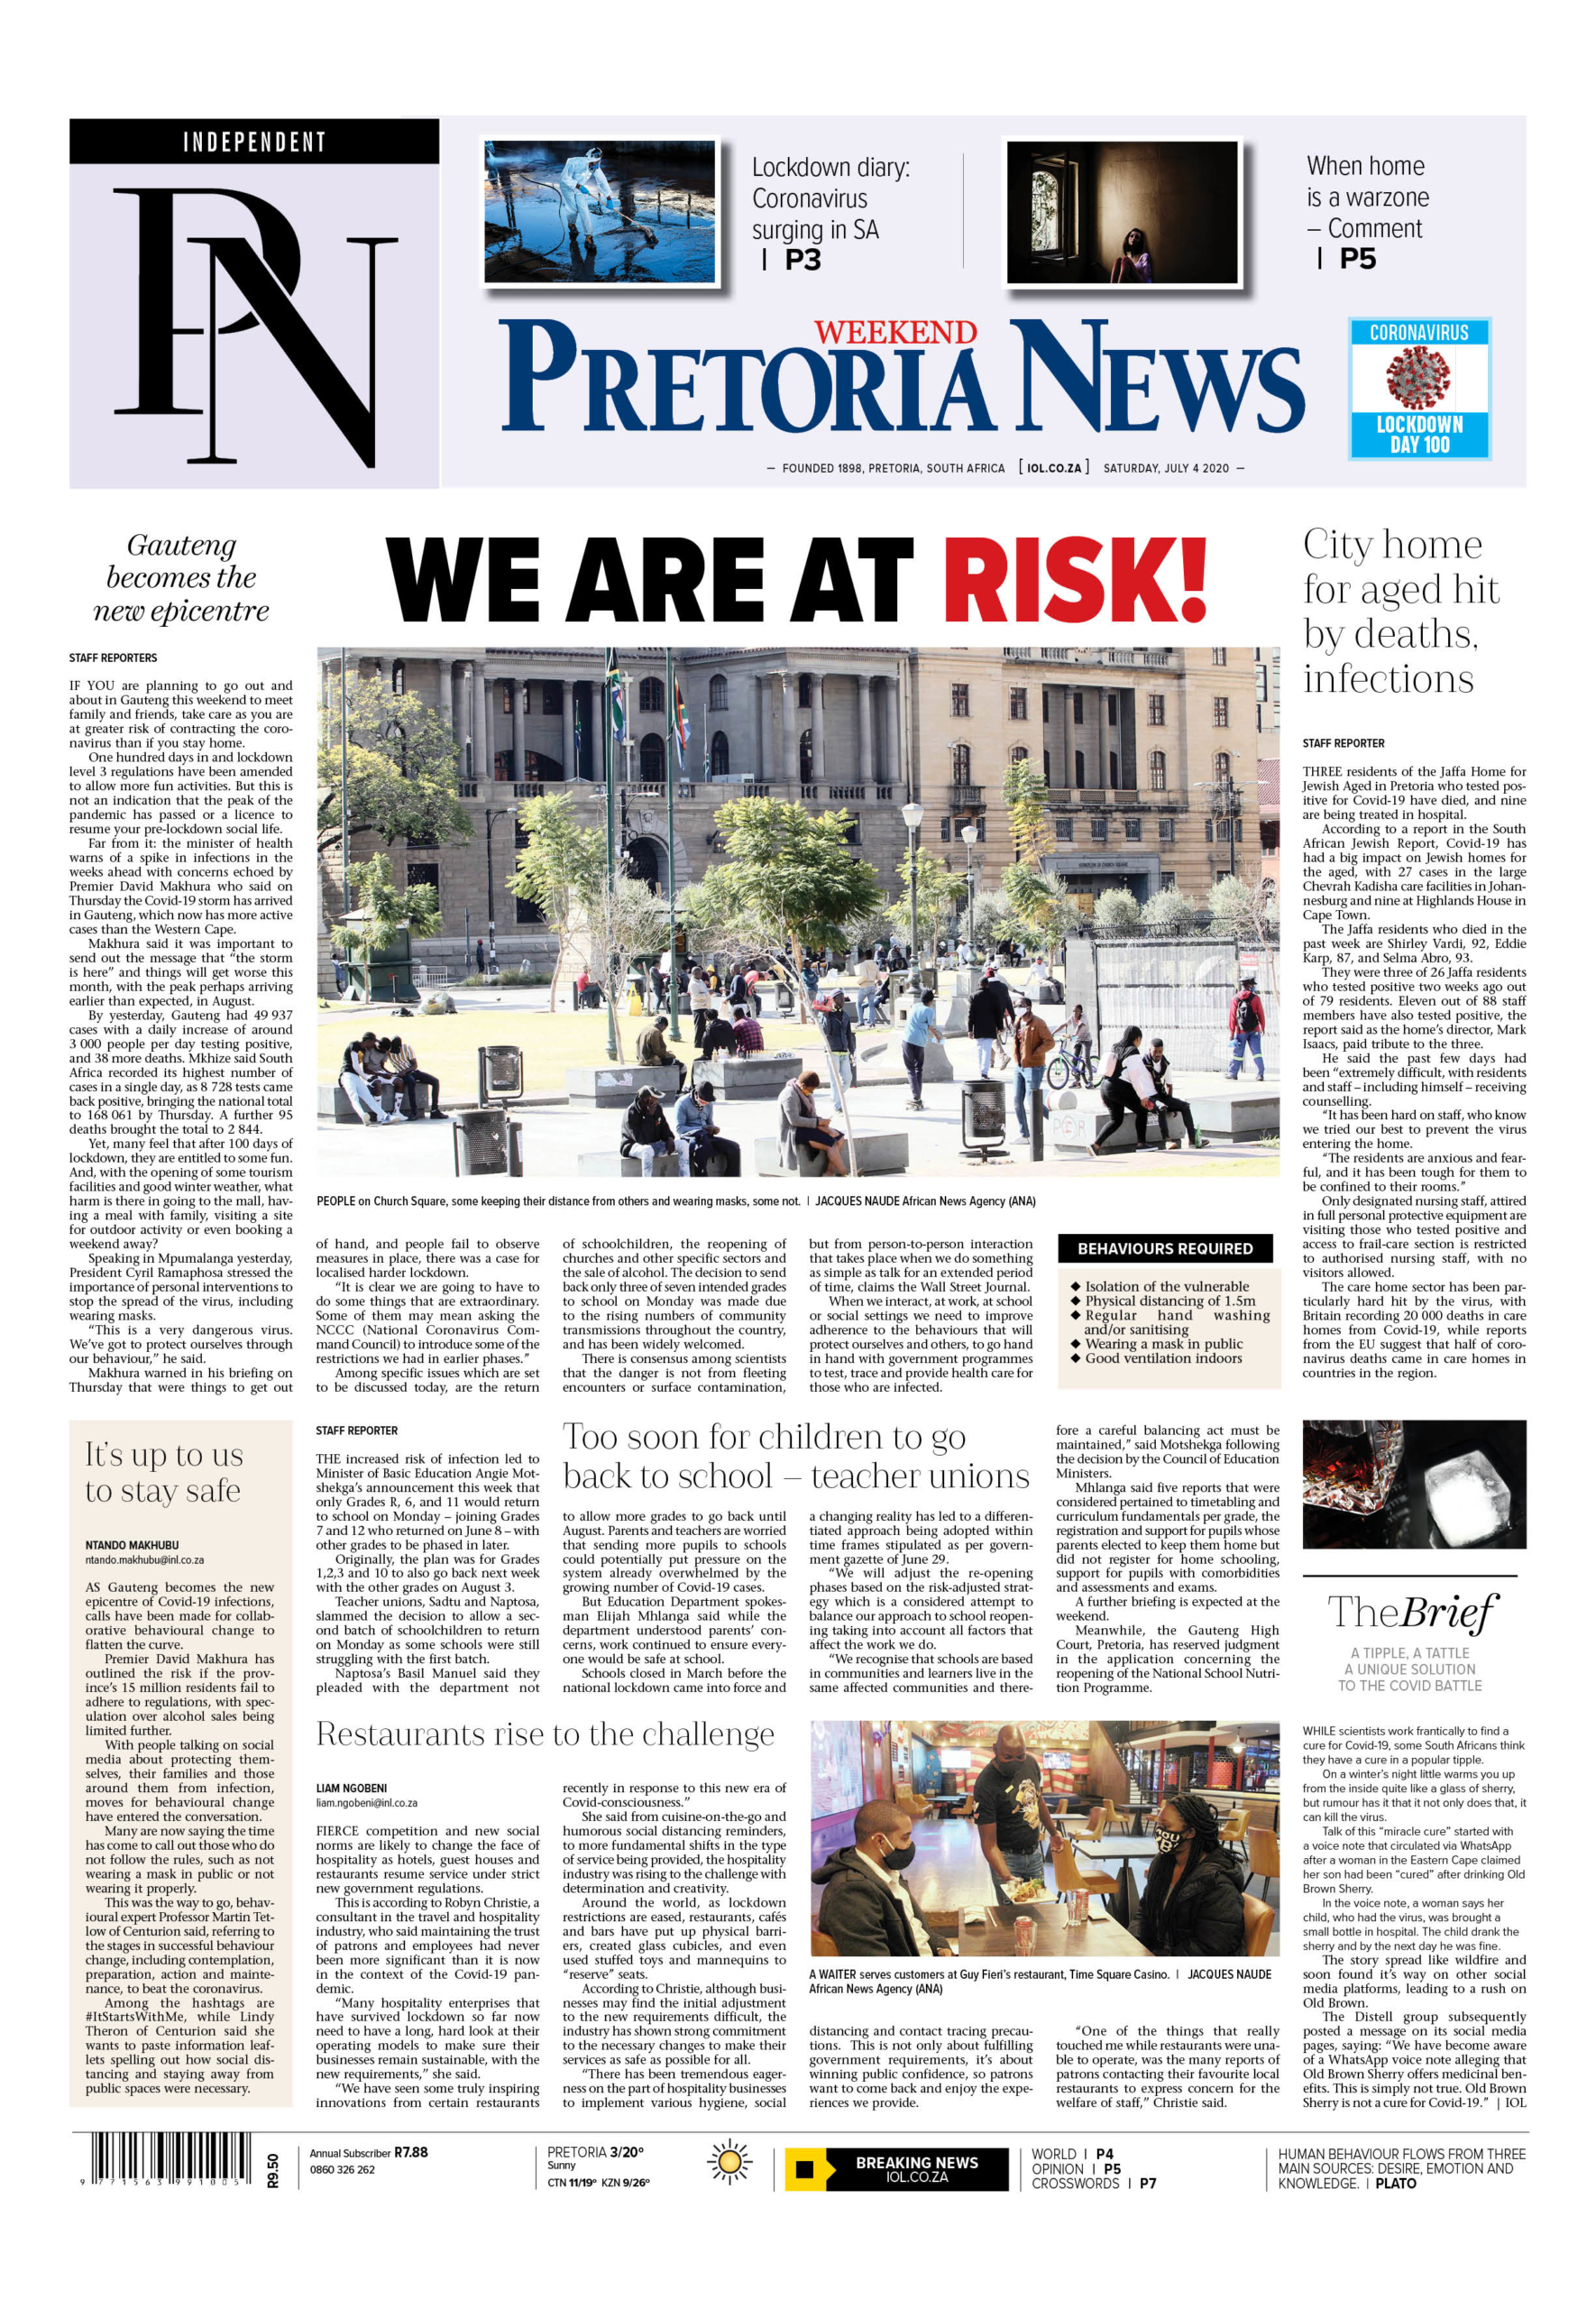 Pretoria News Weekend July 4 2020